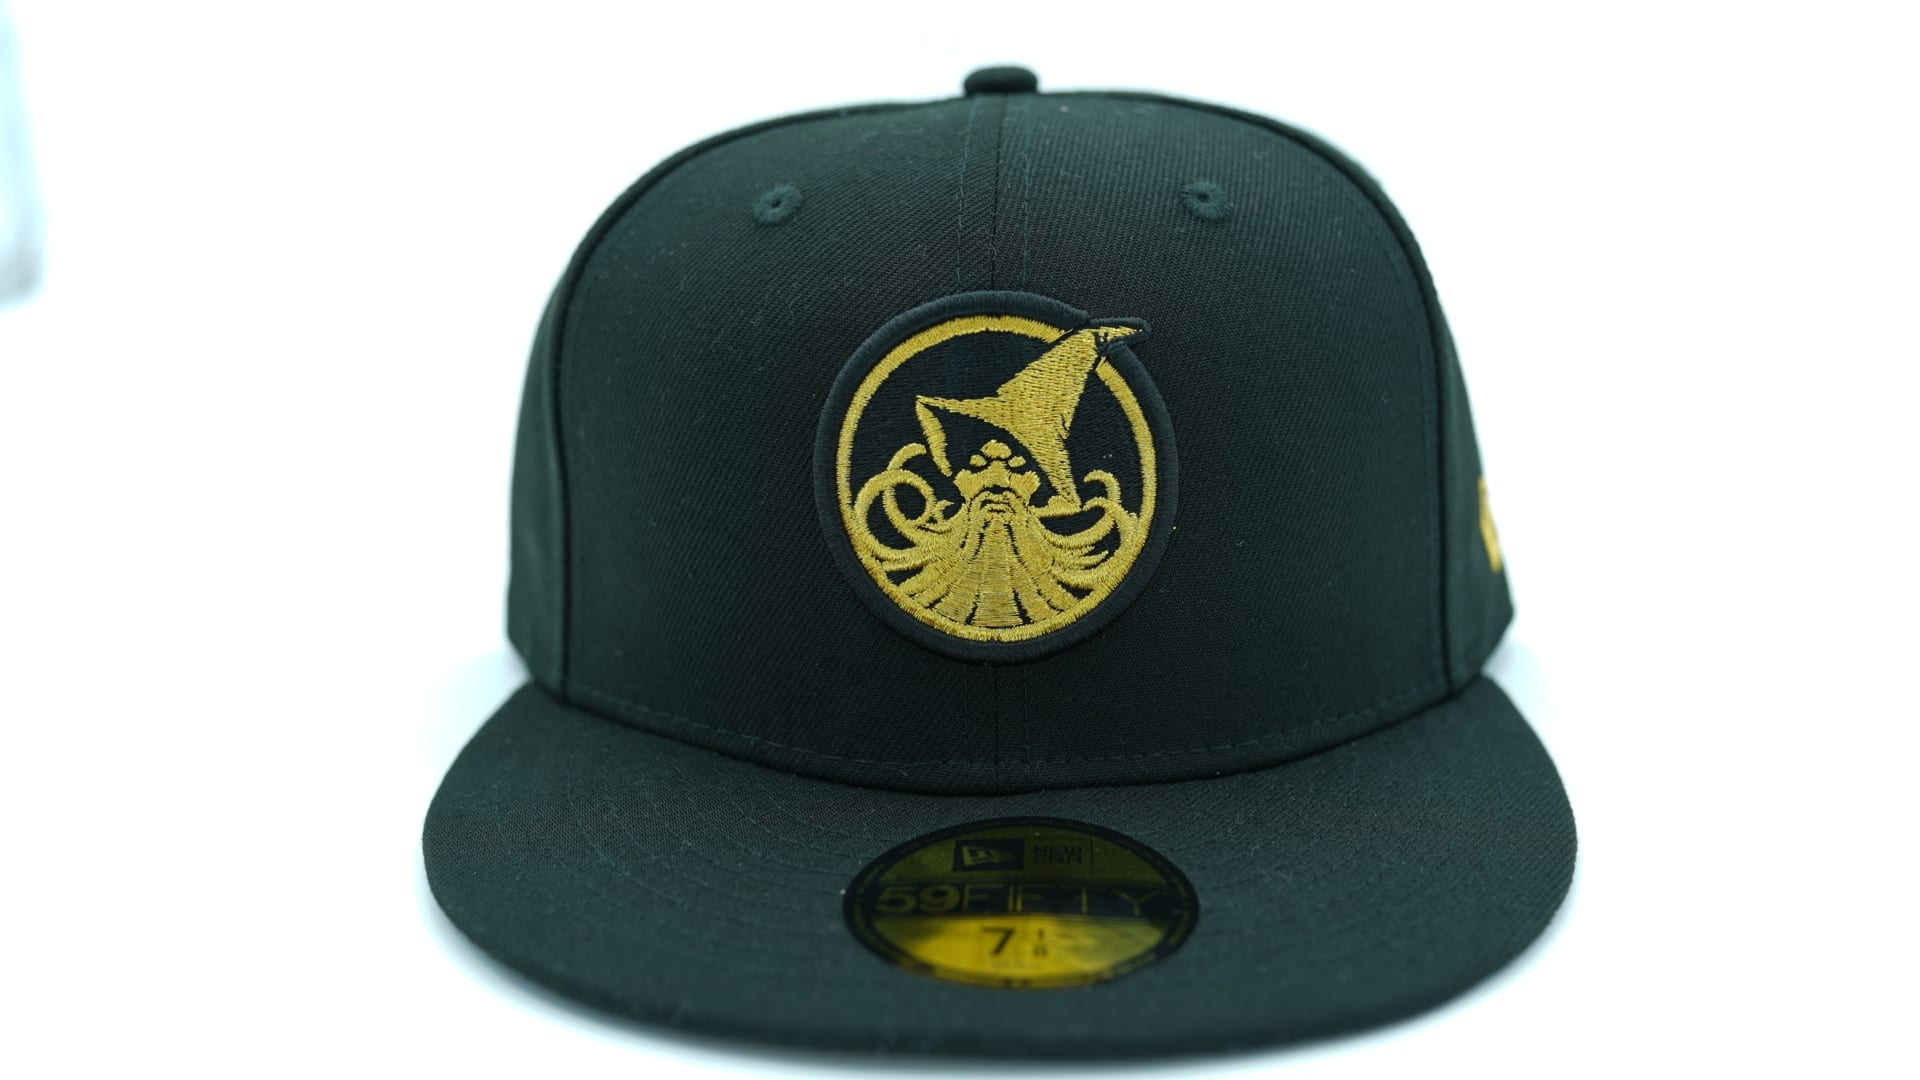 812d410aecb new york yankees hat logo gold 59fifty fitted baseball cap new era mlb